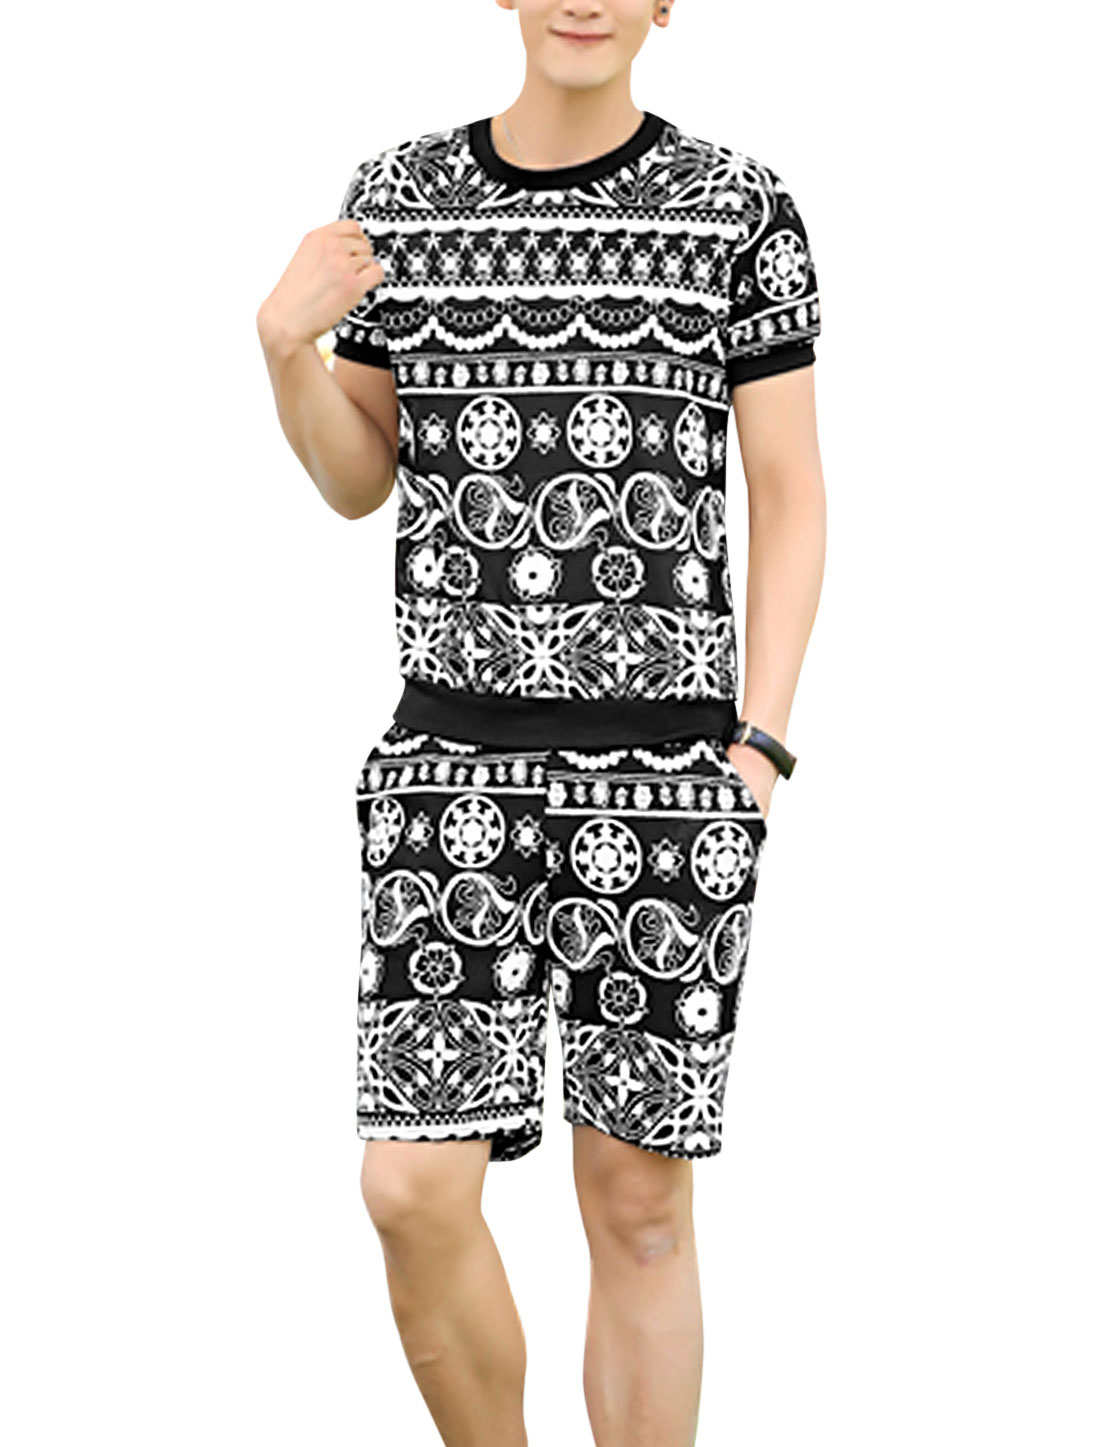 Men Round Neck Short Sleeve Novelty Prints Top w Shorts Black White S